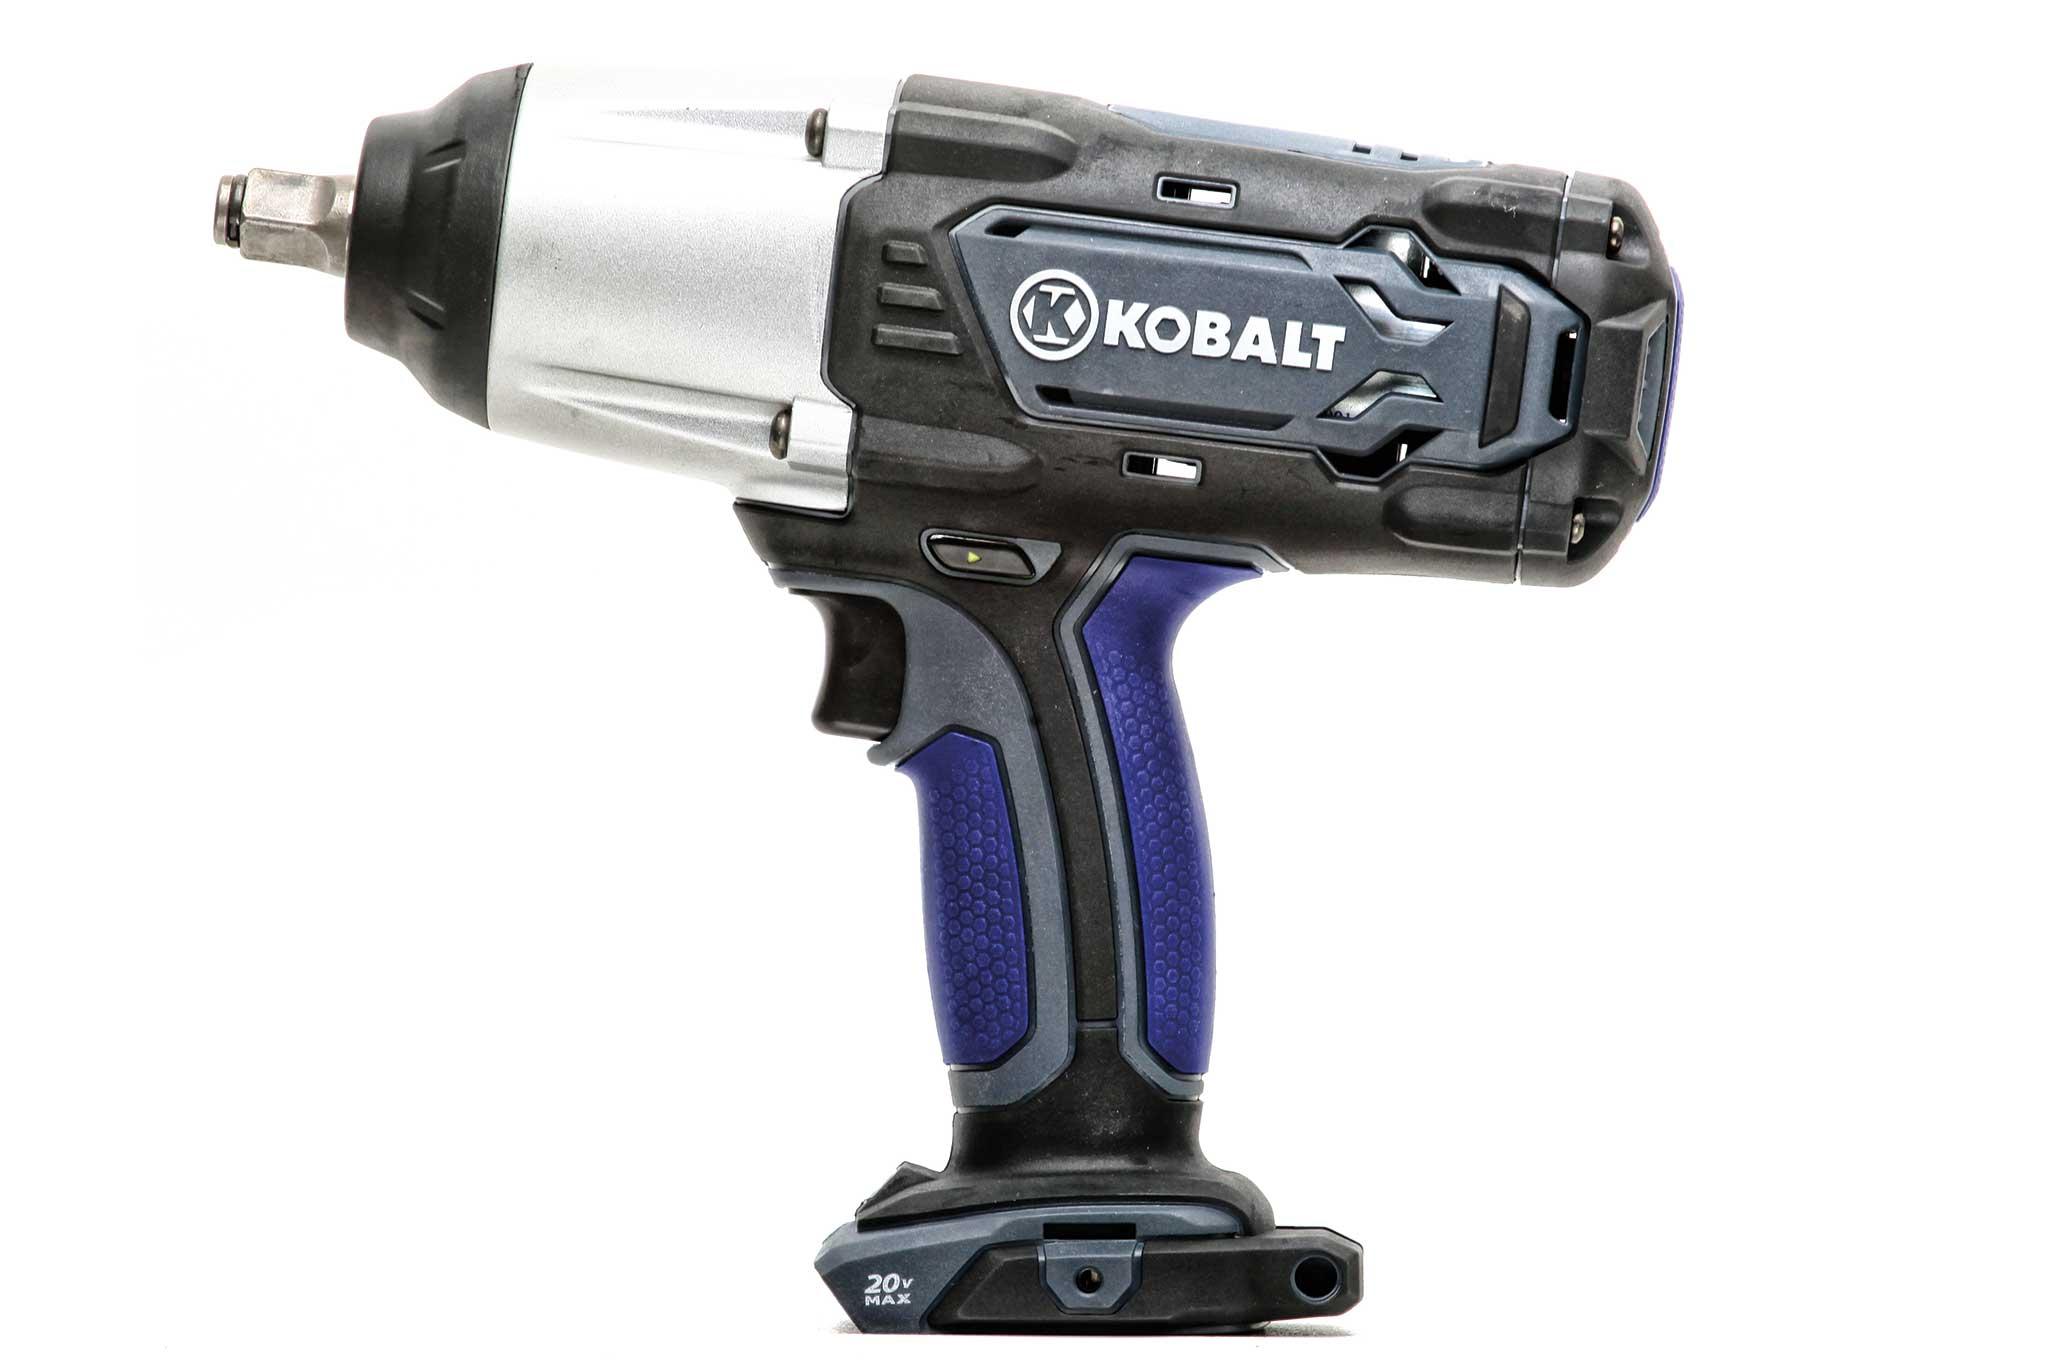 Kobalt 24v 1 2 Inch Impact Wrench Tool Reviews